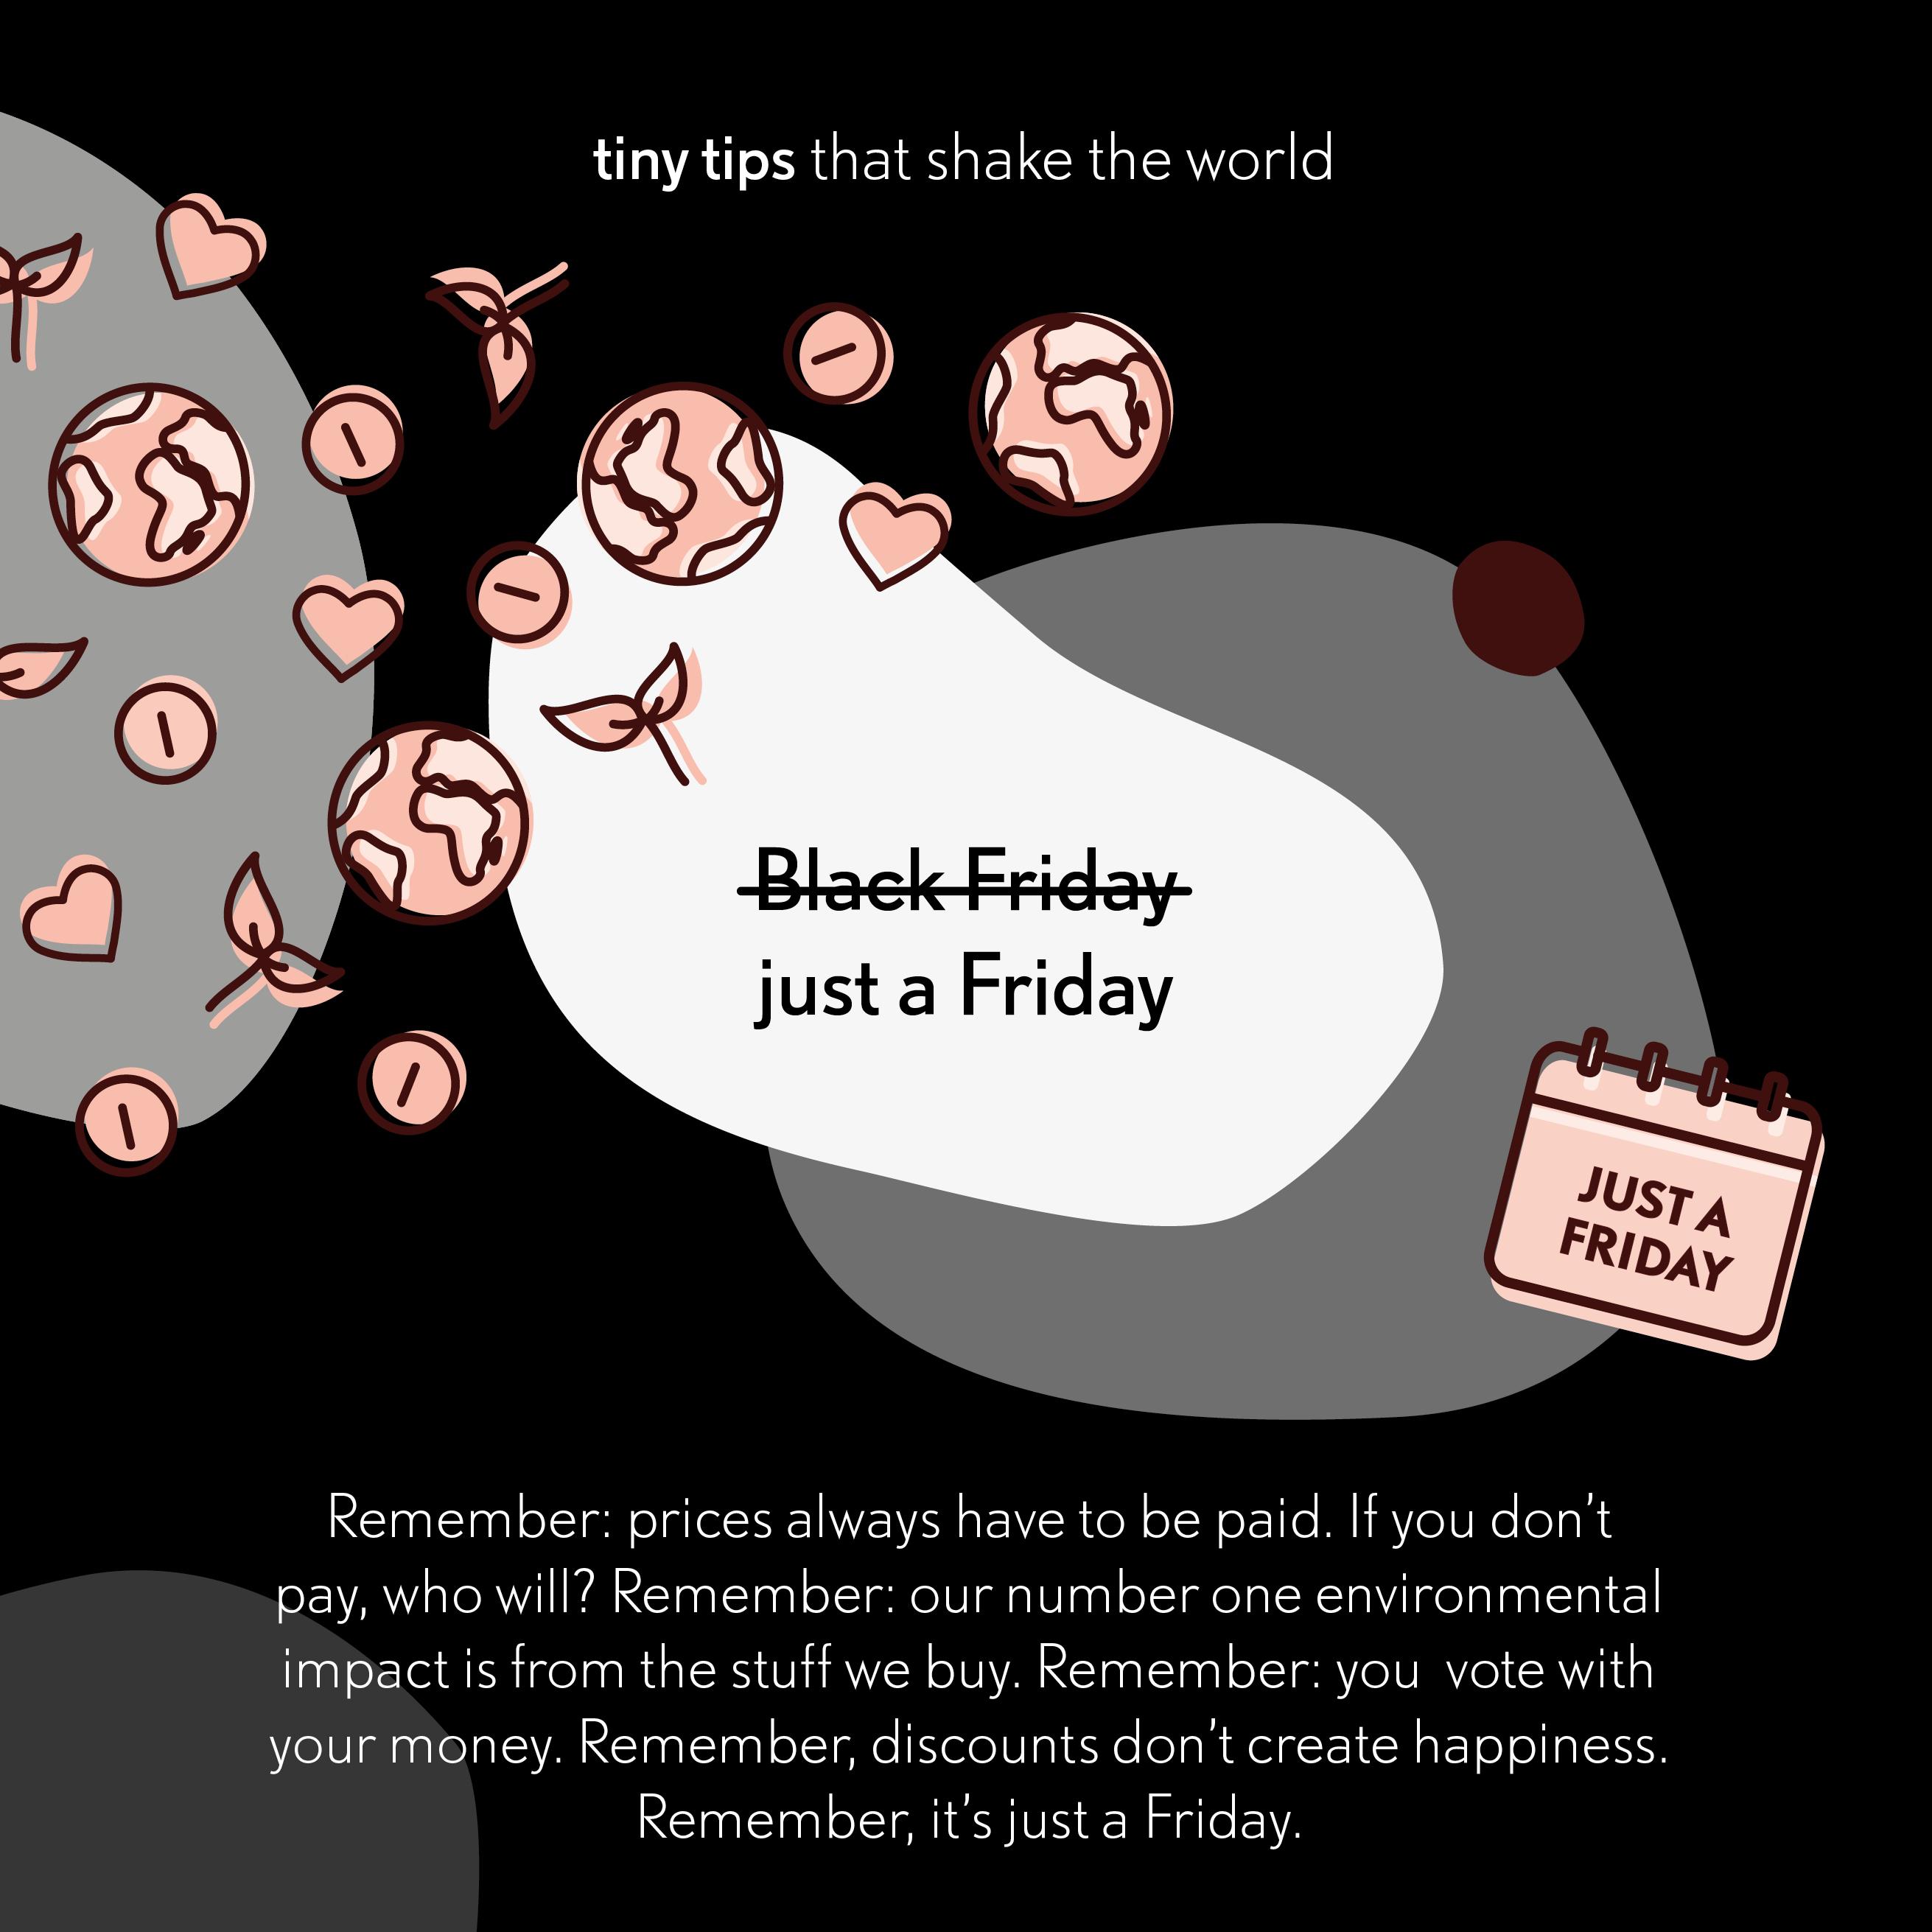 20191129 Black Friday Tiny tips that shake the world